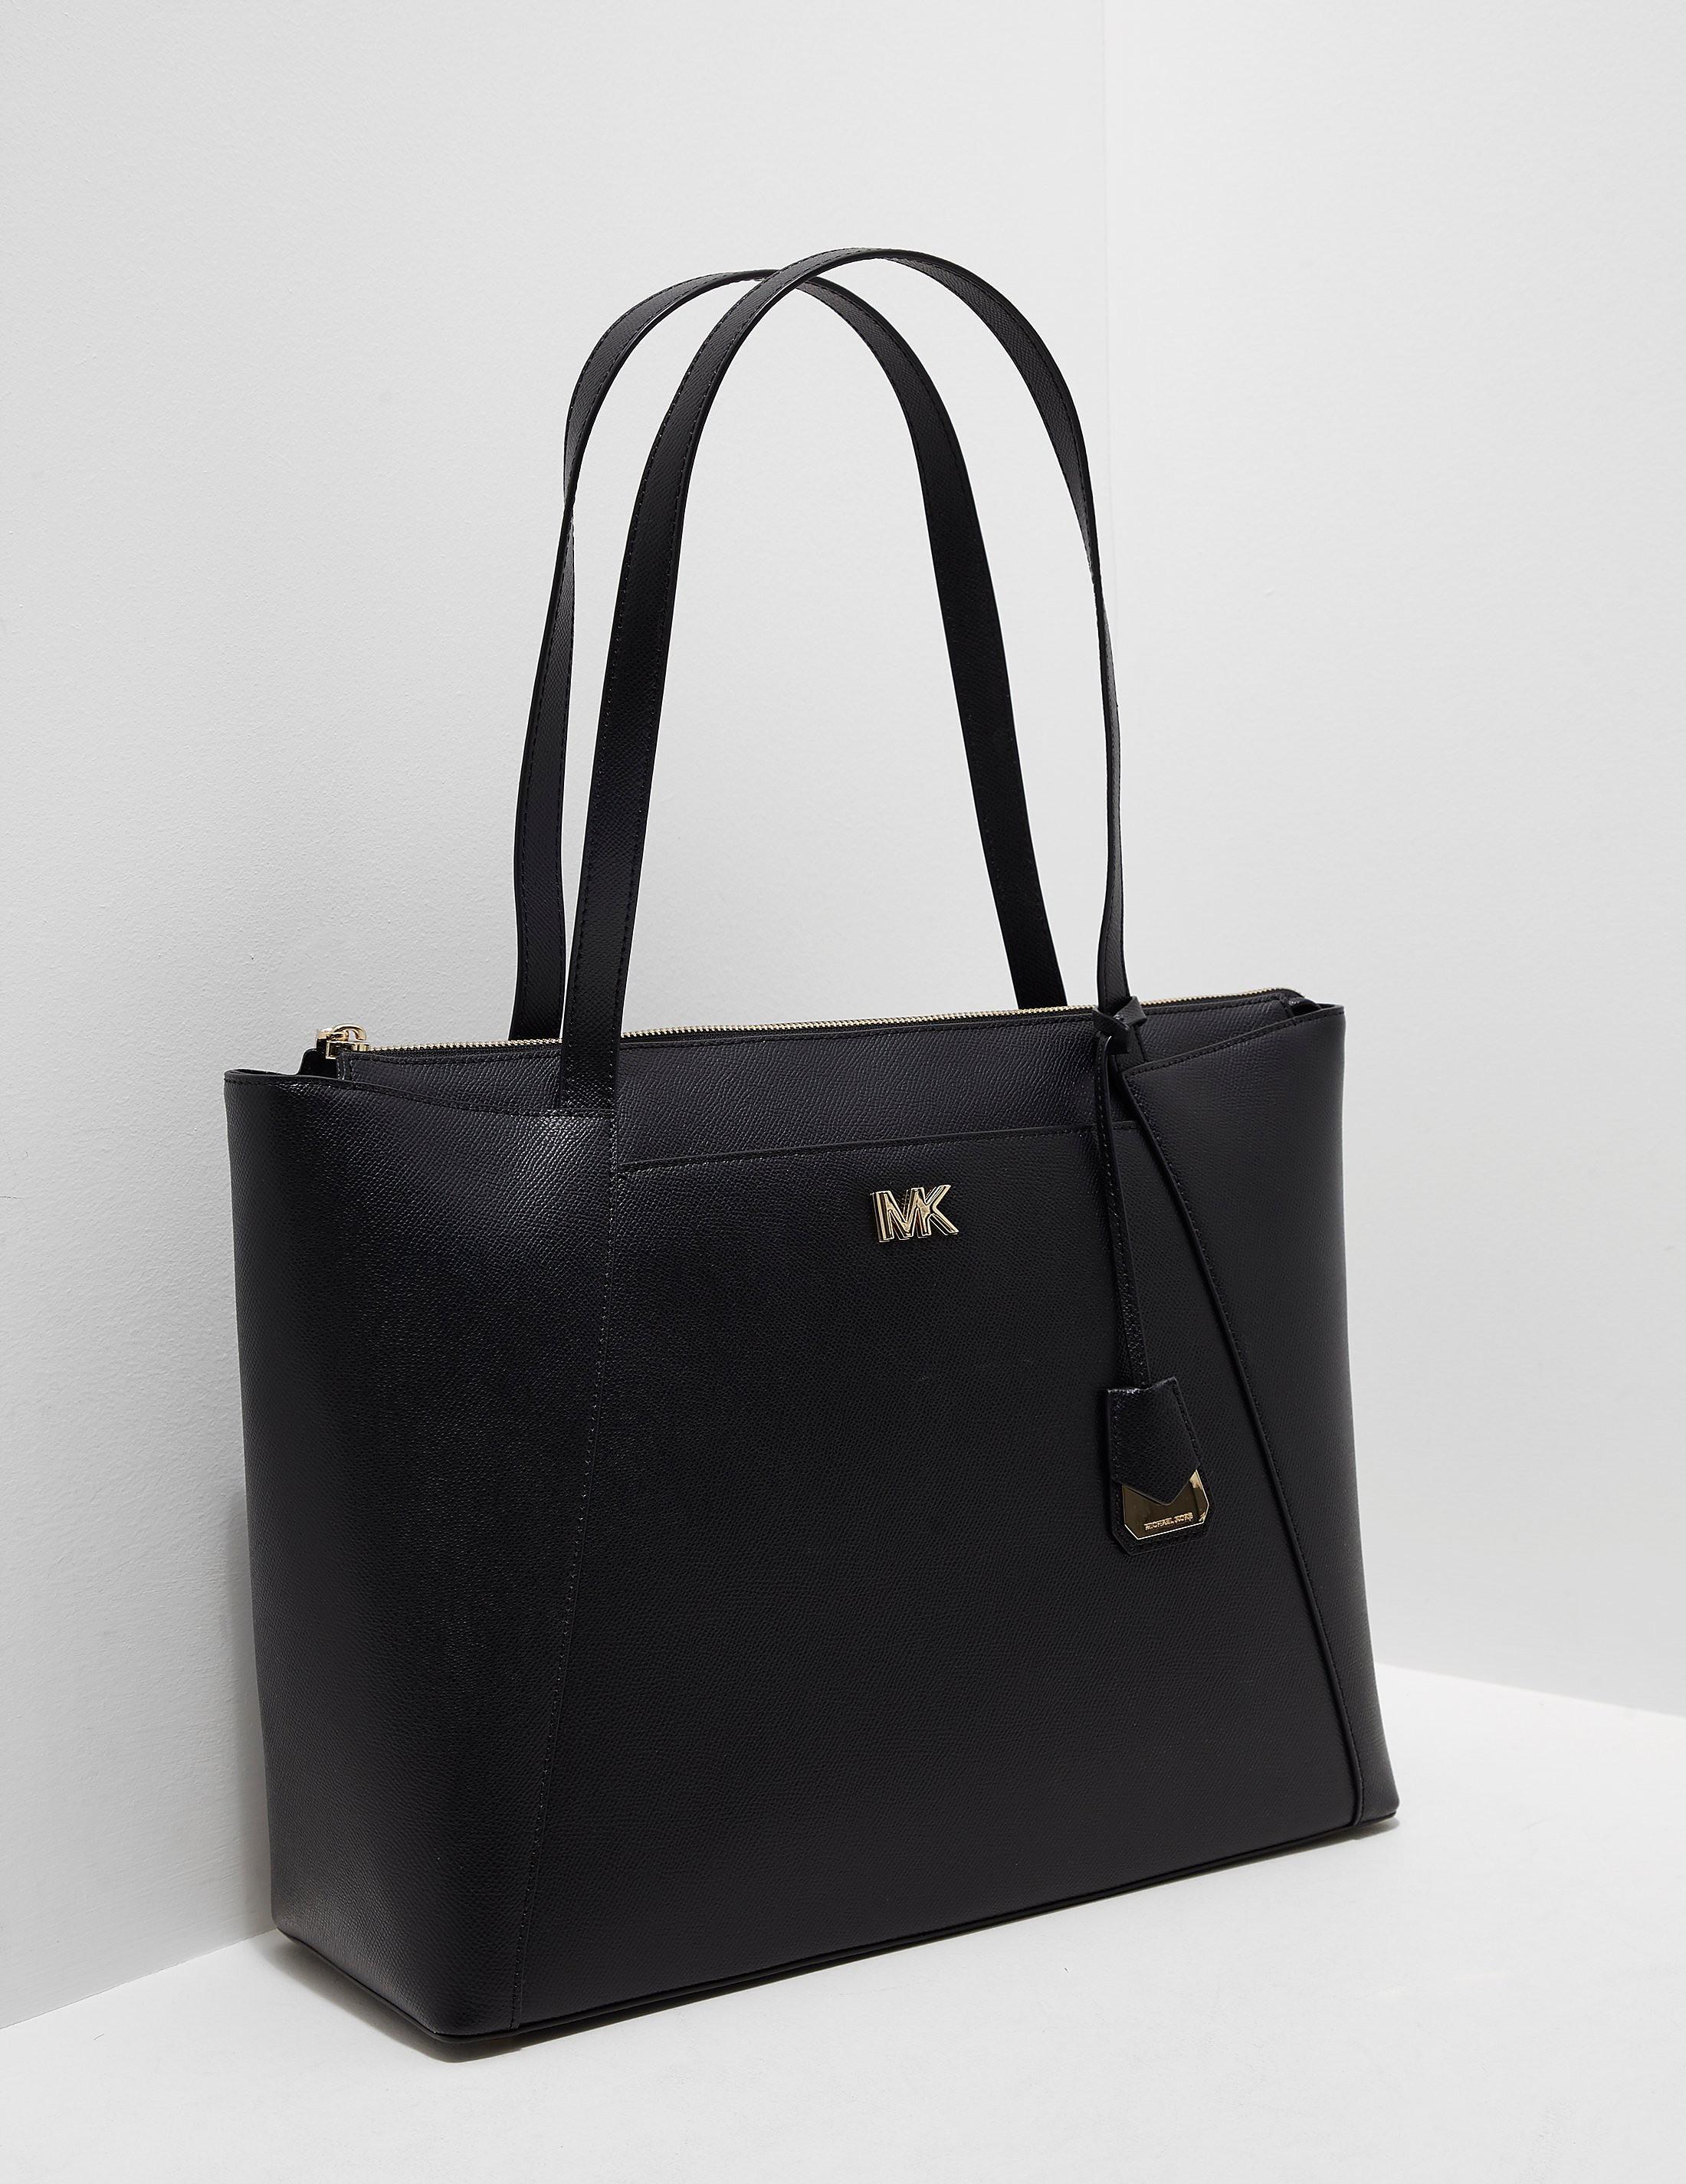 Michael Kors Maddie Large East West Bag